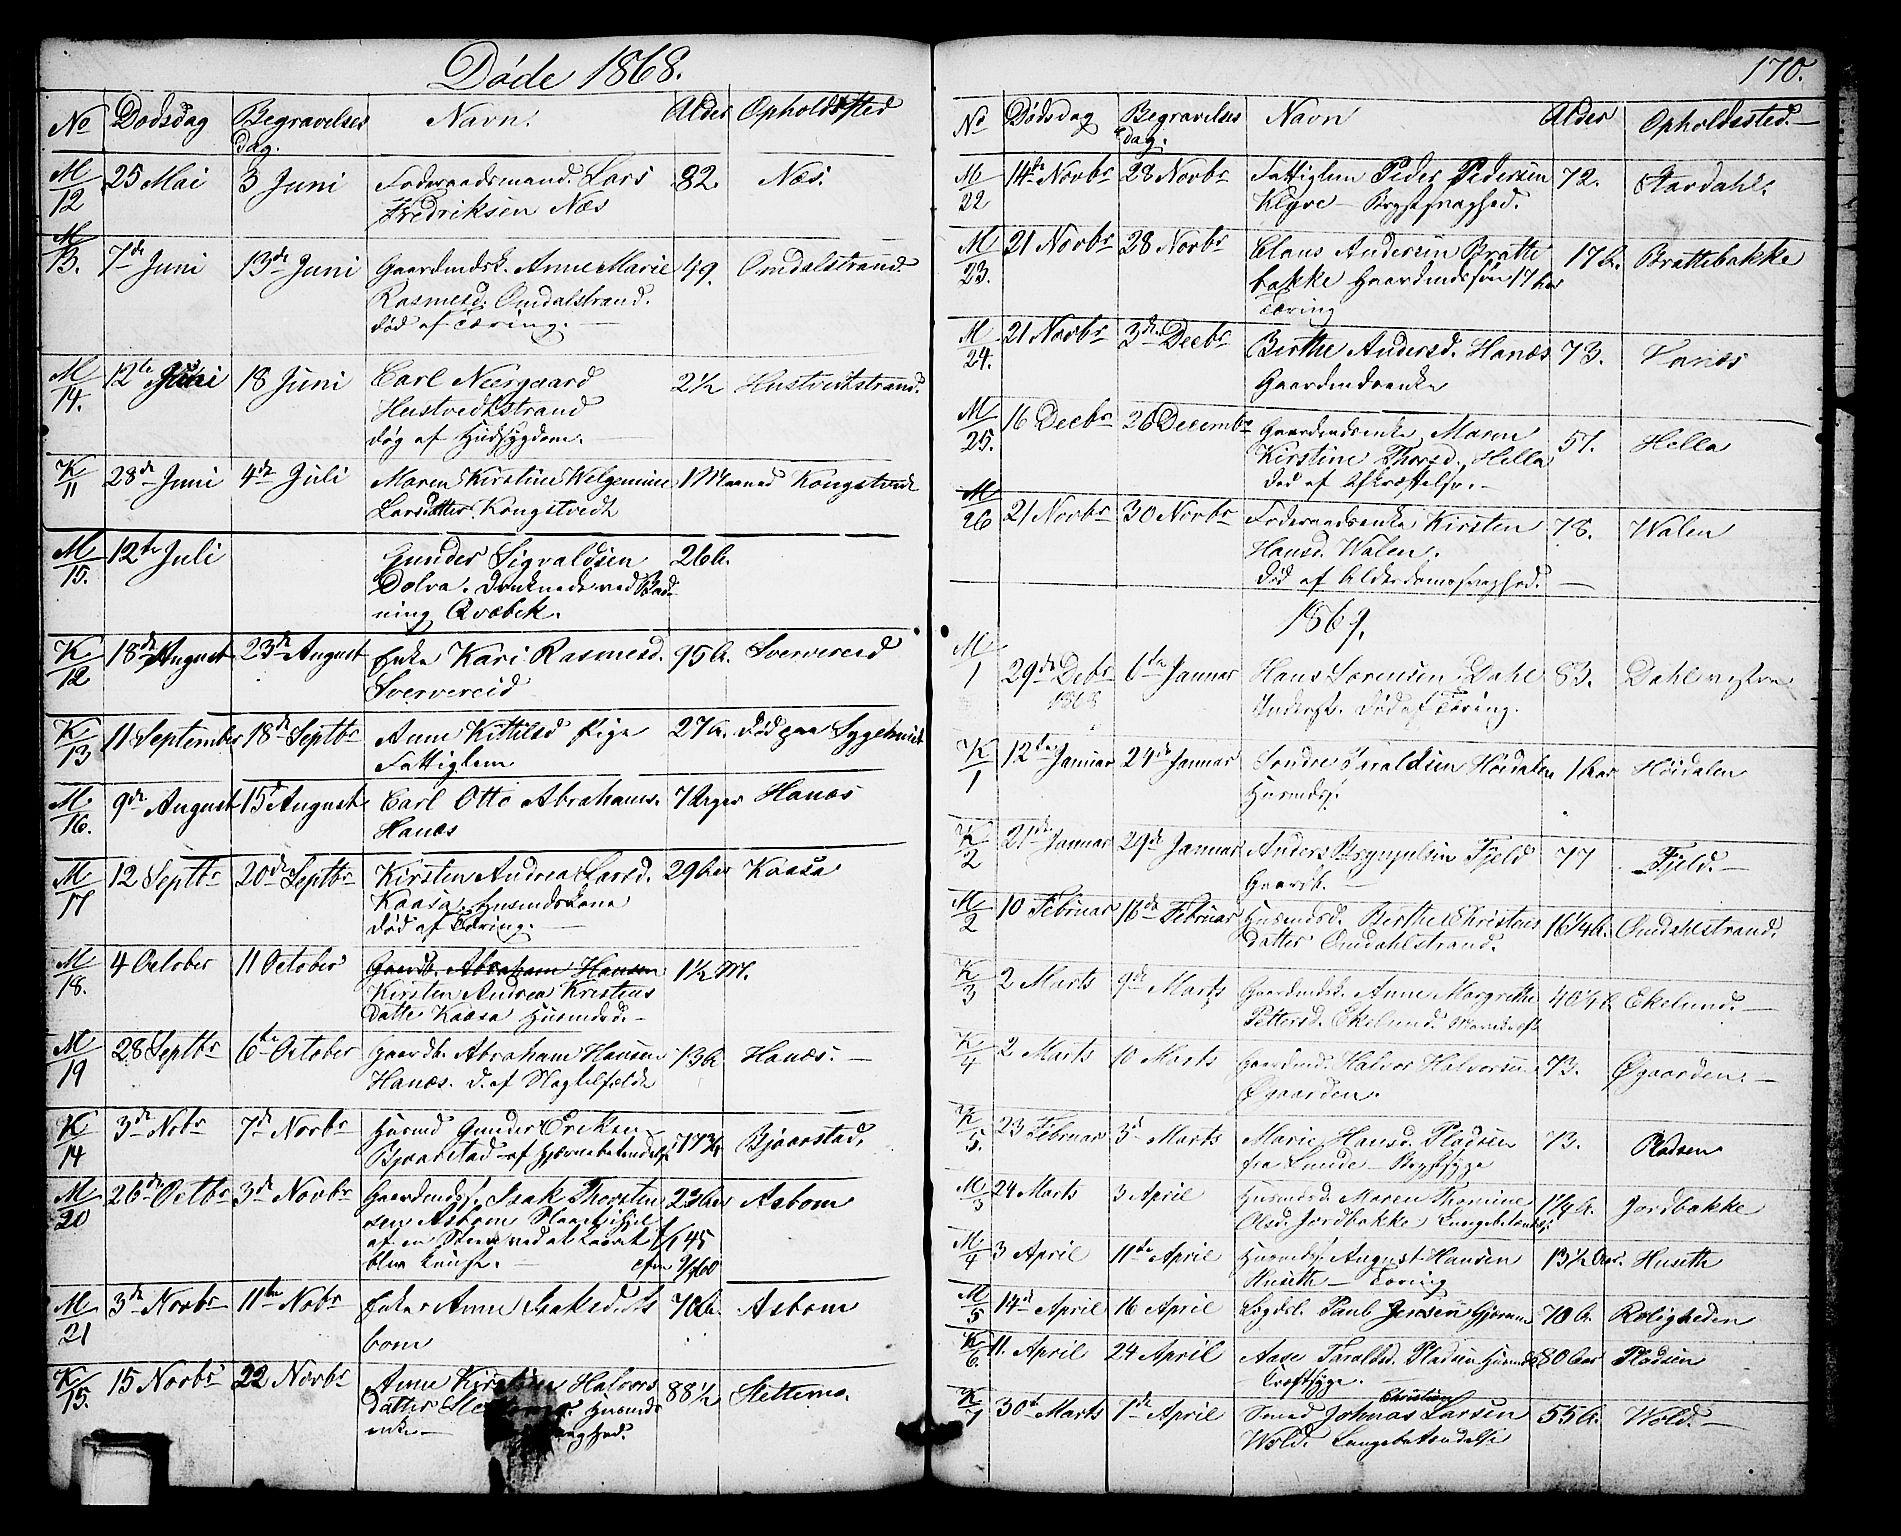 SAKO, Solum kirkebøker, G/Gb/L0002: Klokkerbok nr. II 2, 1859-1879, s. 170